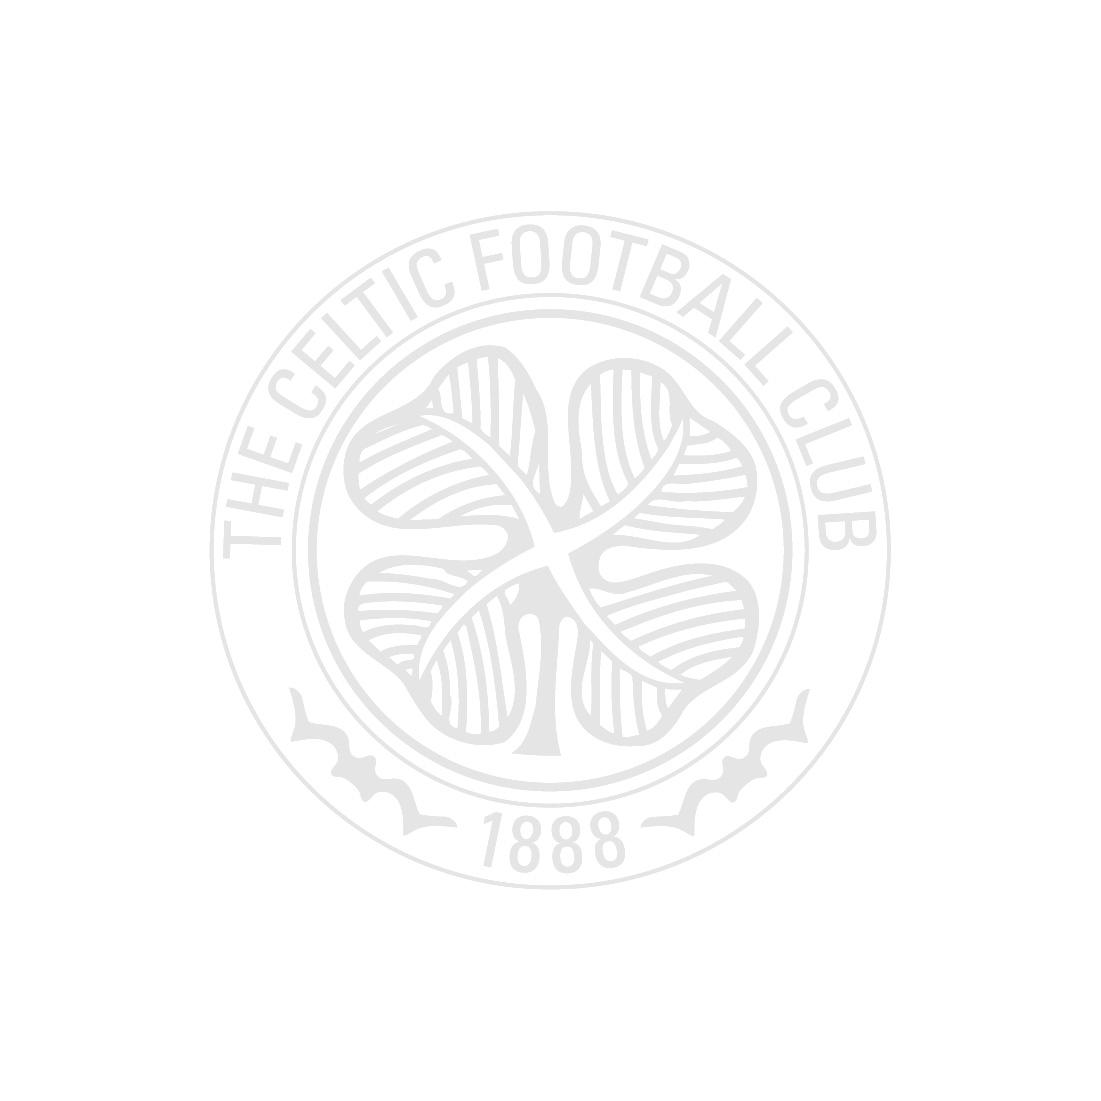 Celtic In The Black & White Era Book